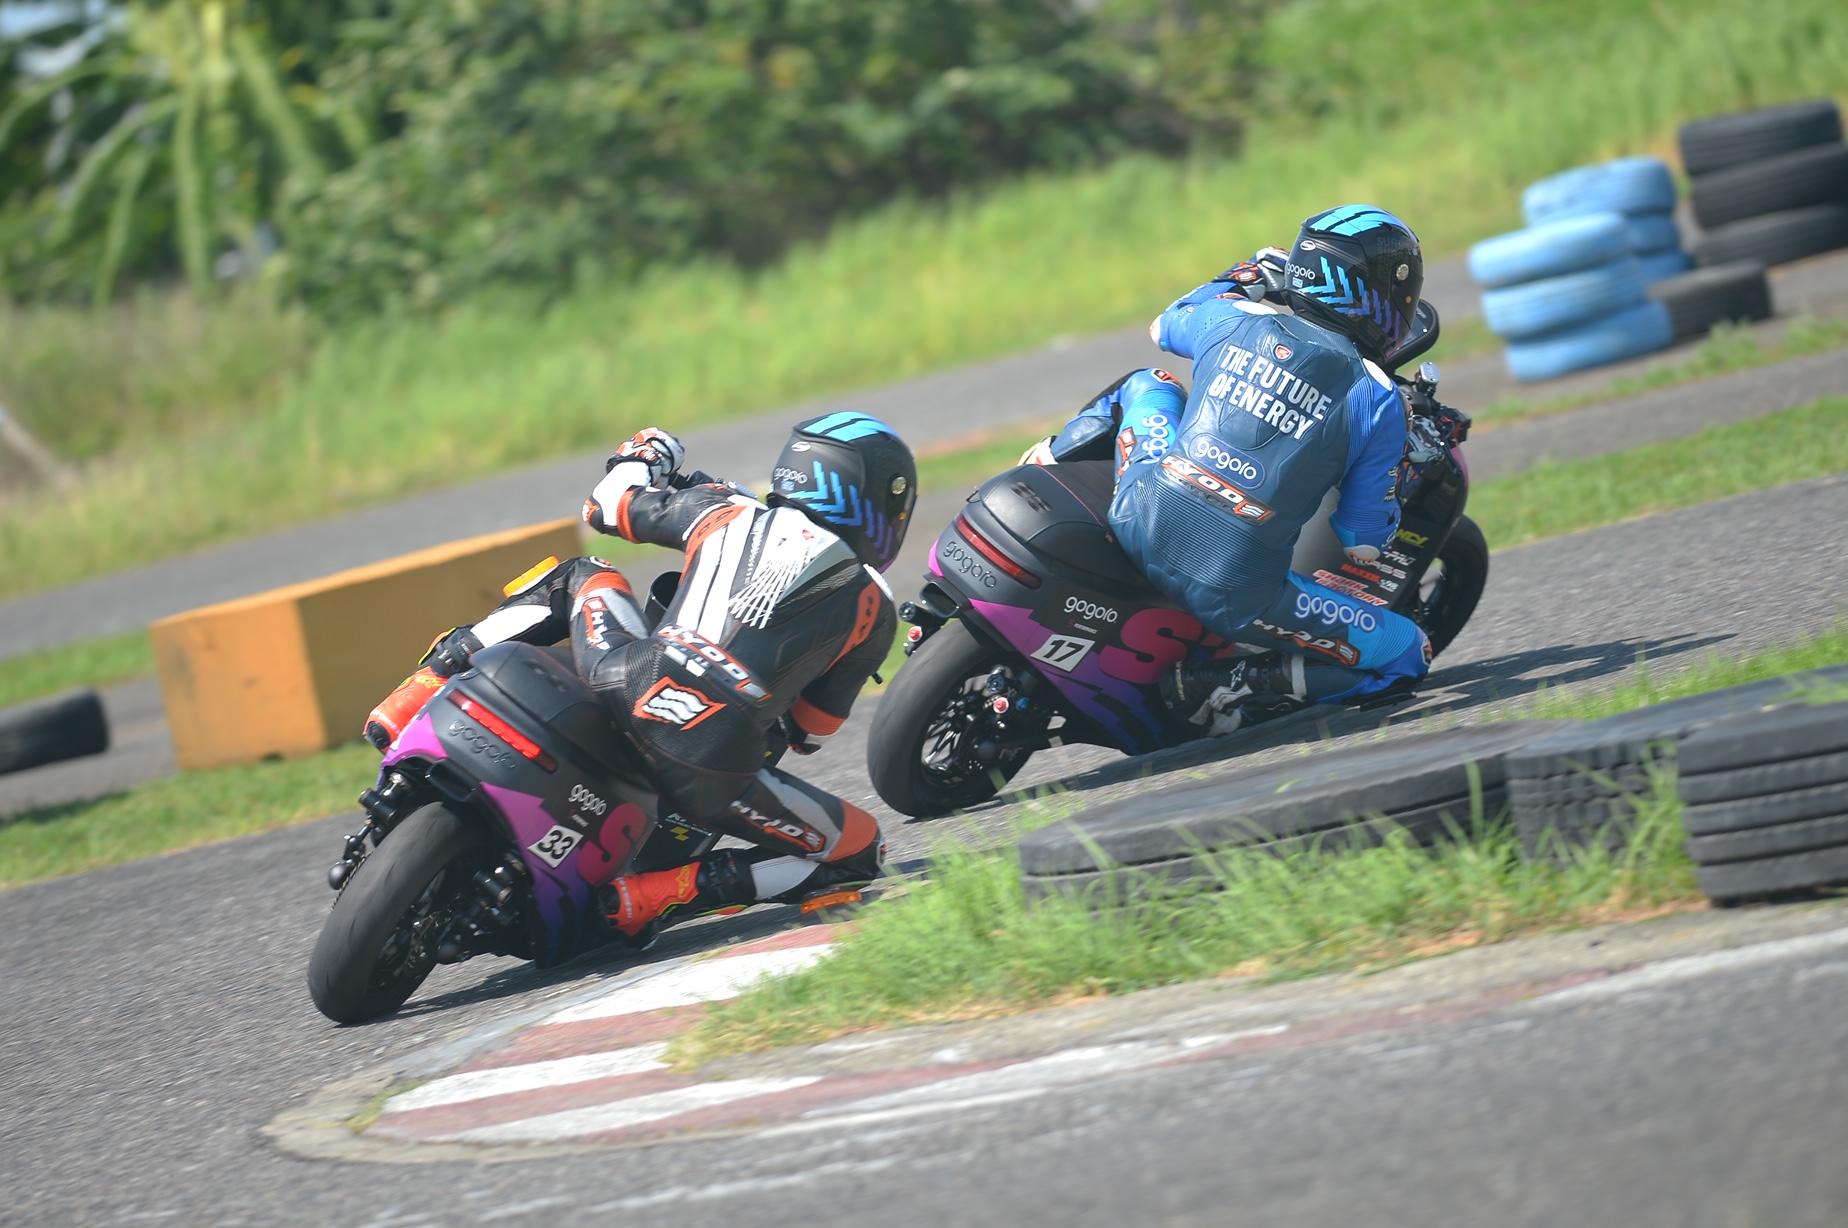 Gogoro 廠隊的 Gogoro S3 曩括桿位和第二起跑的機會。